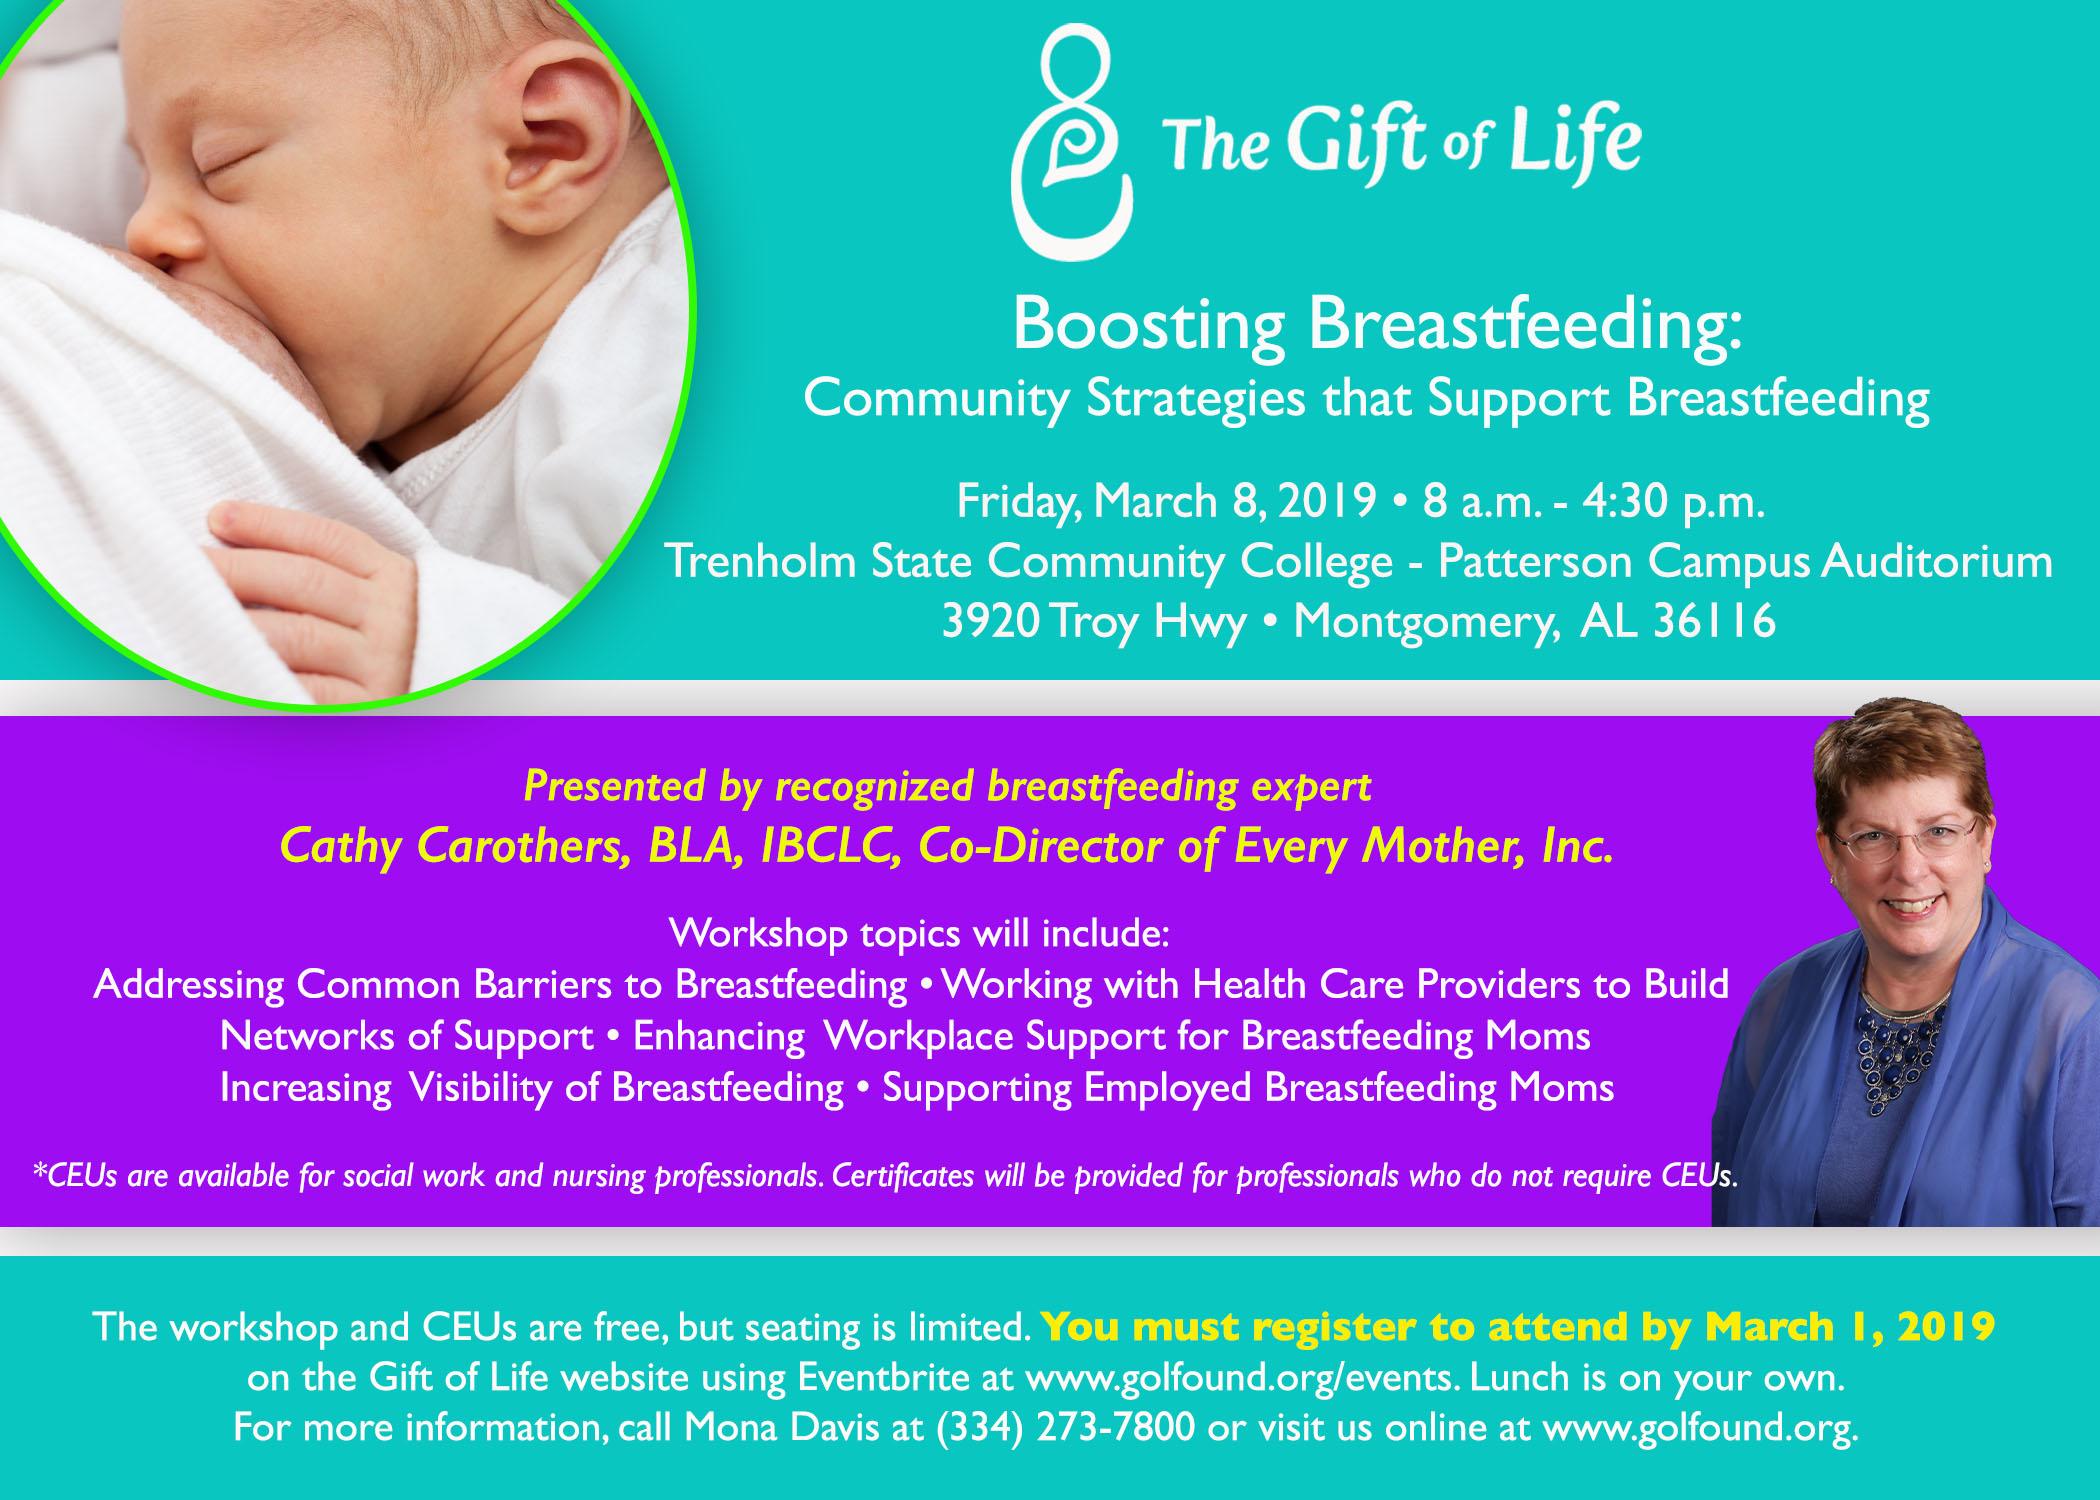 2019 Breastfeeding Workshop Flyer